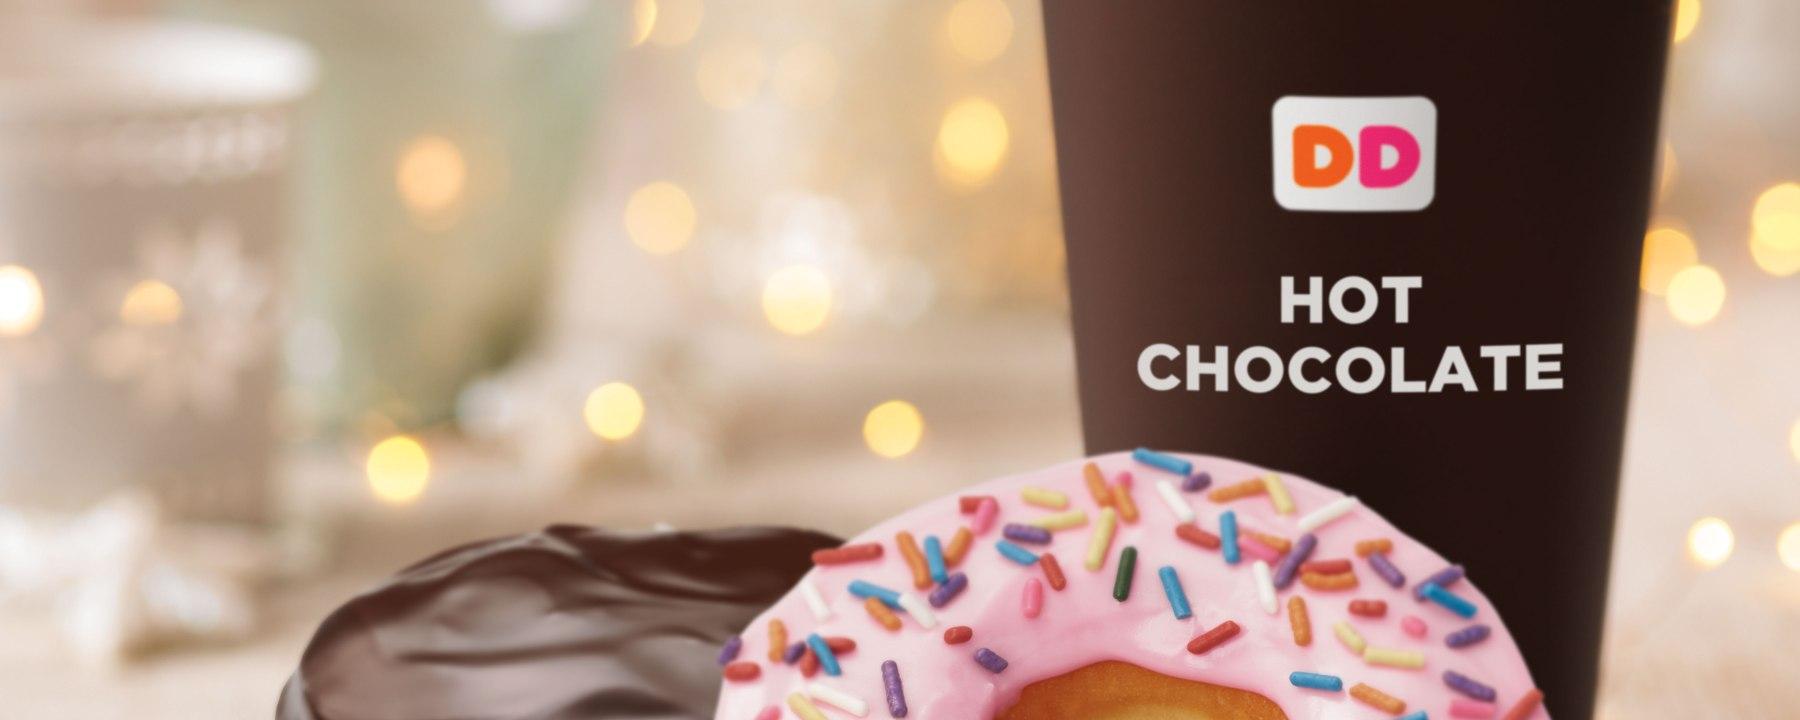 chocolate dunkin donuts